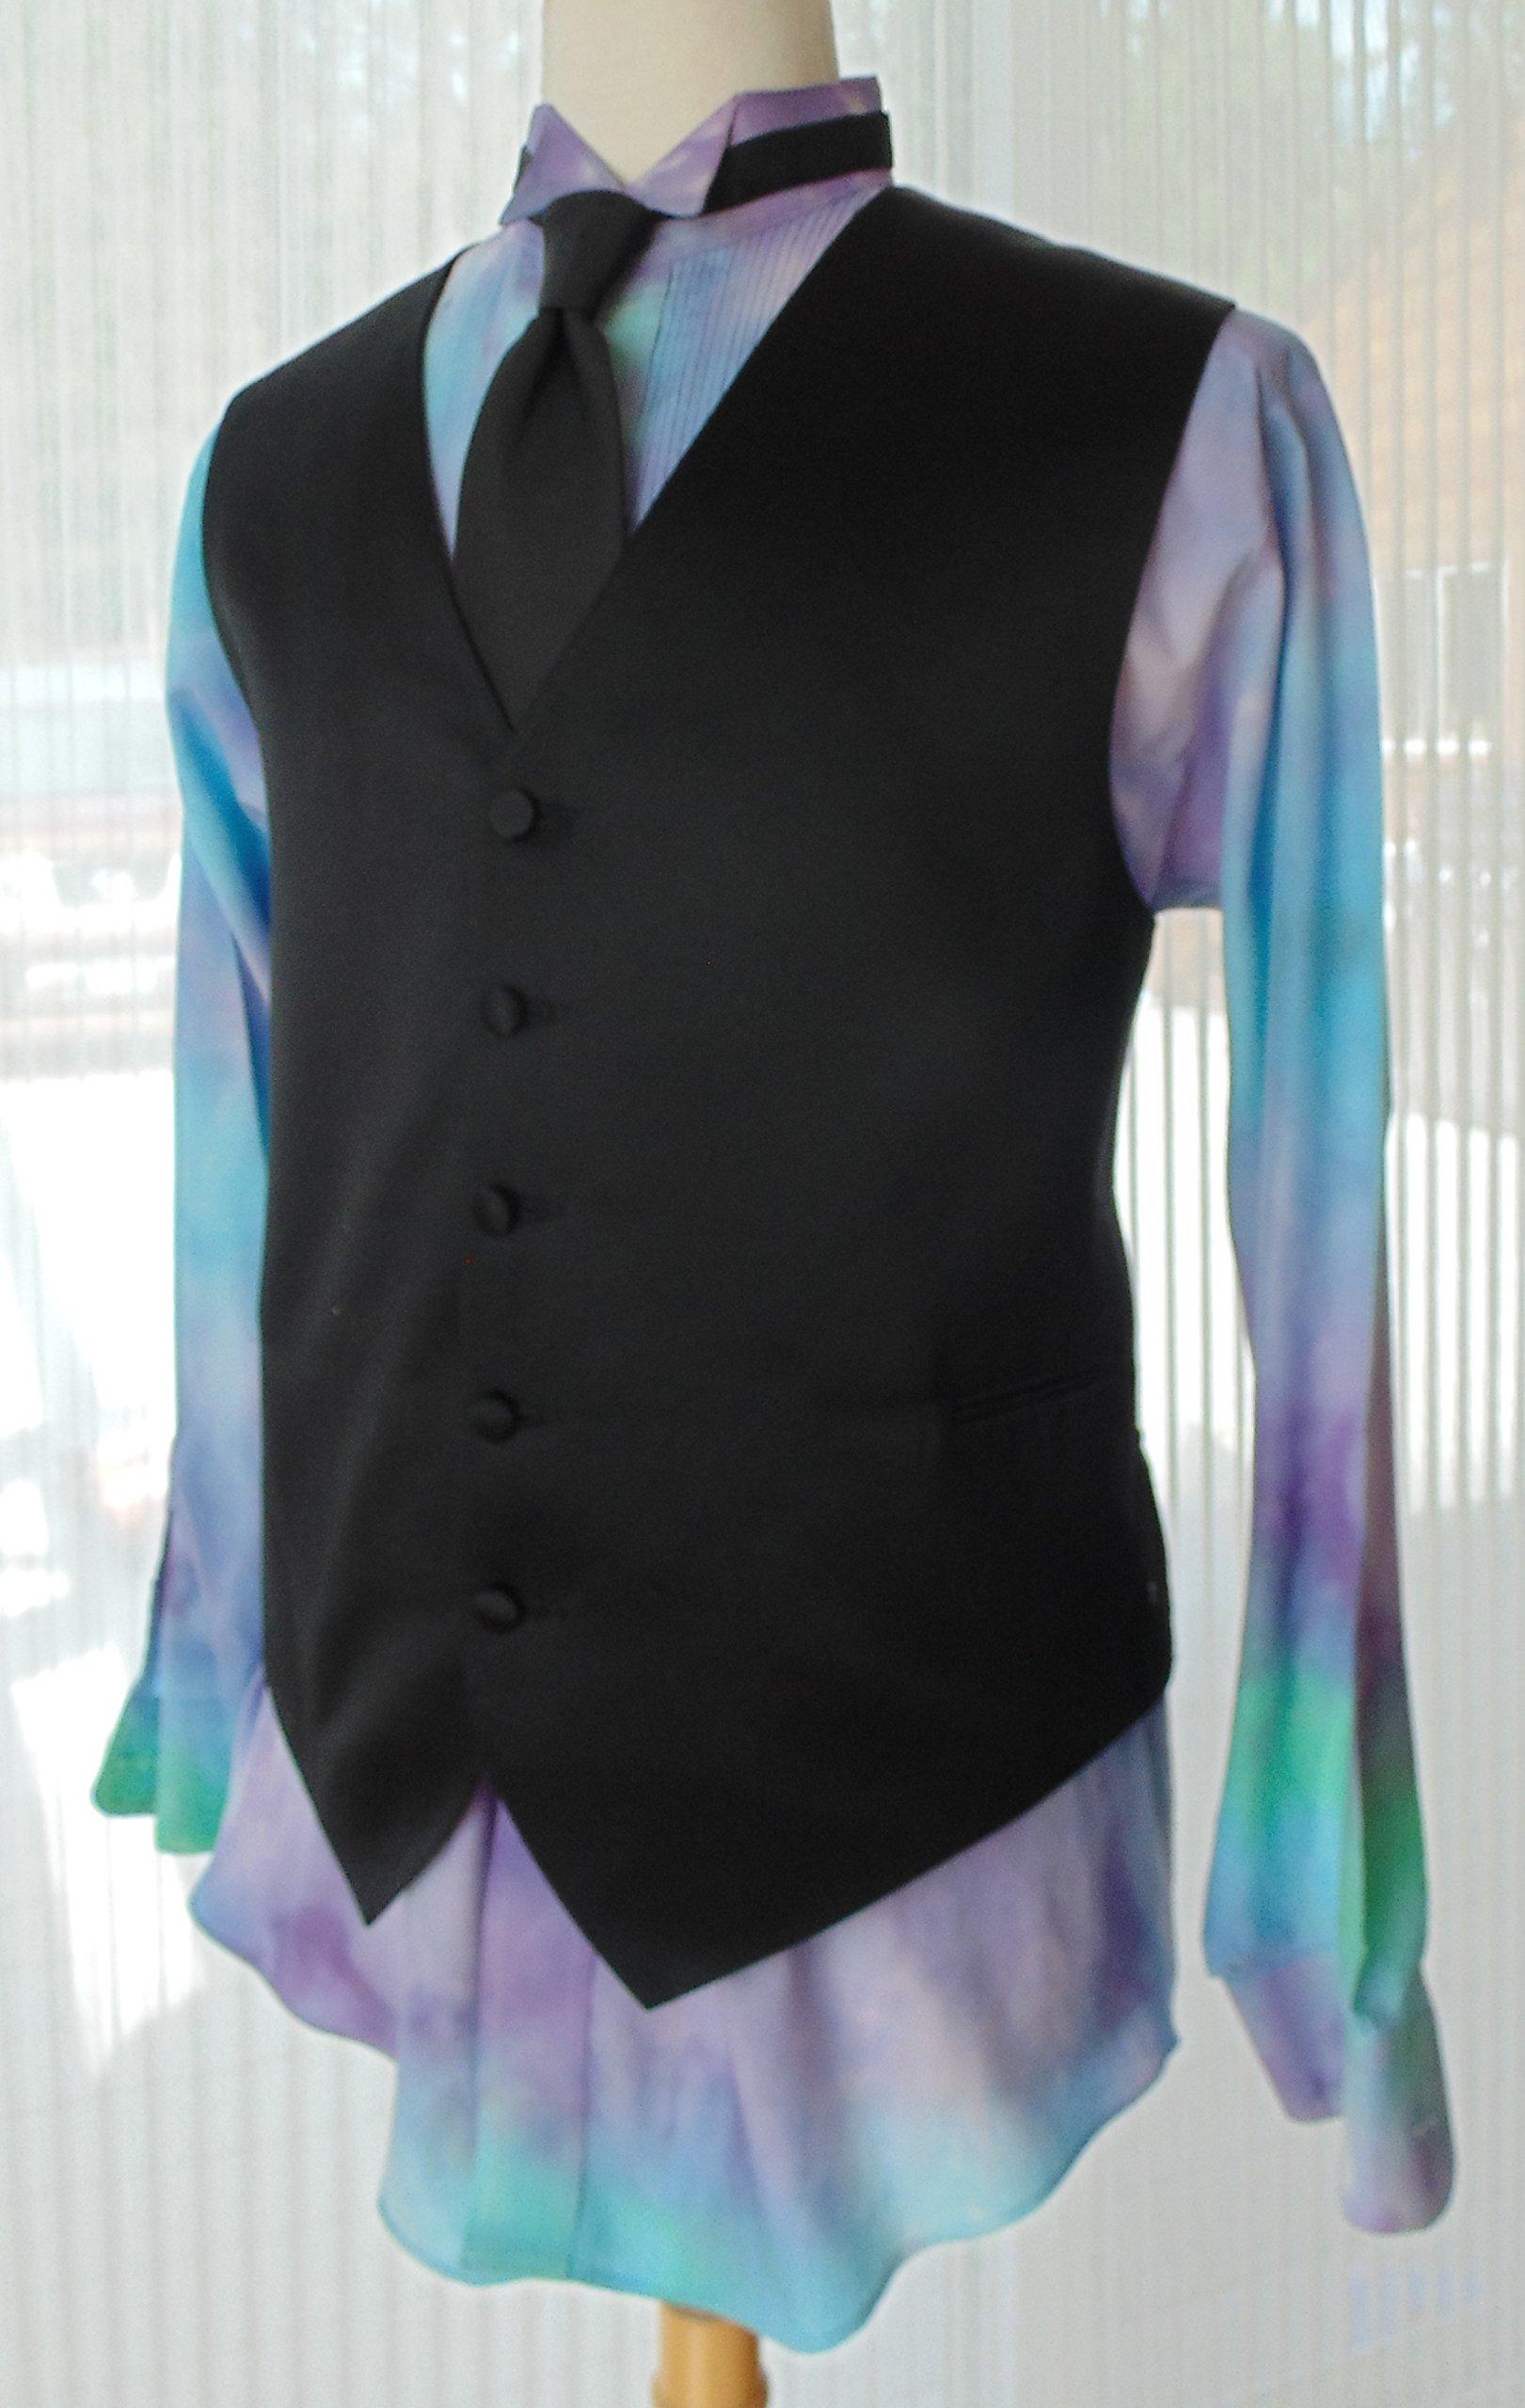 Men's L Hand Tie-dye Tuxedo Shirt